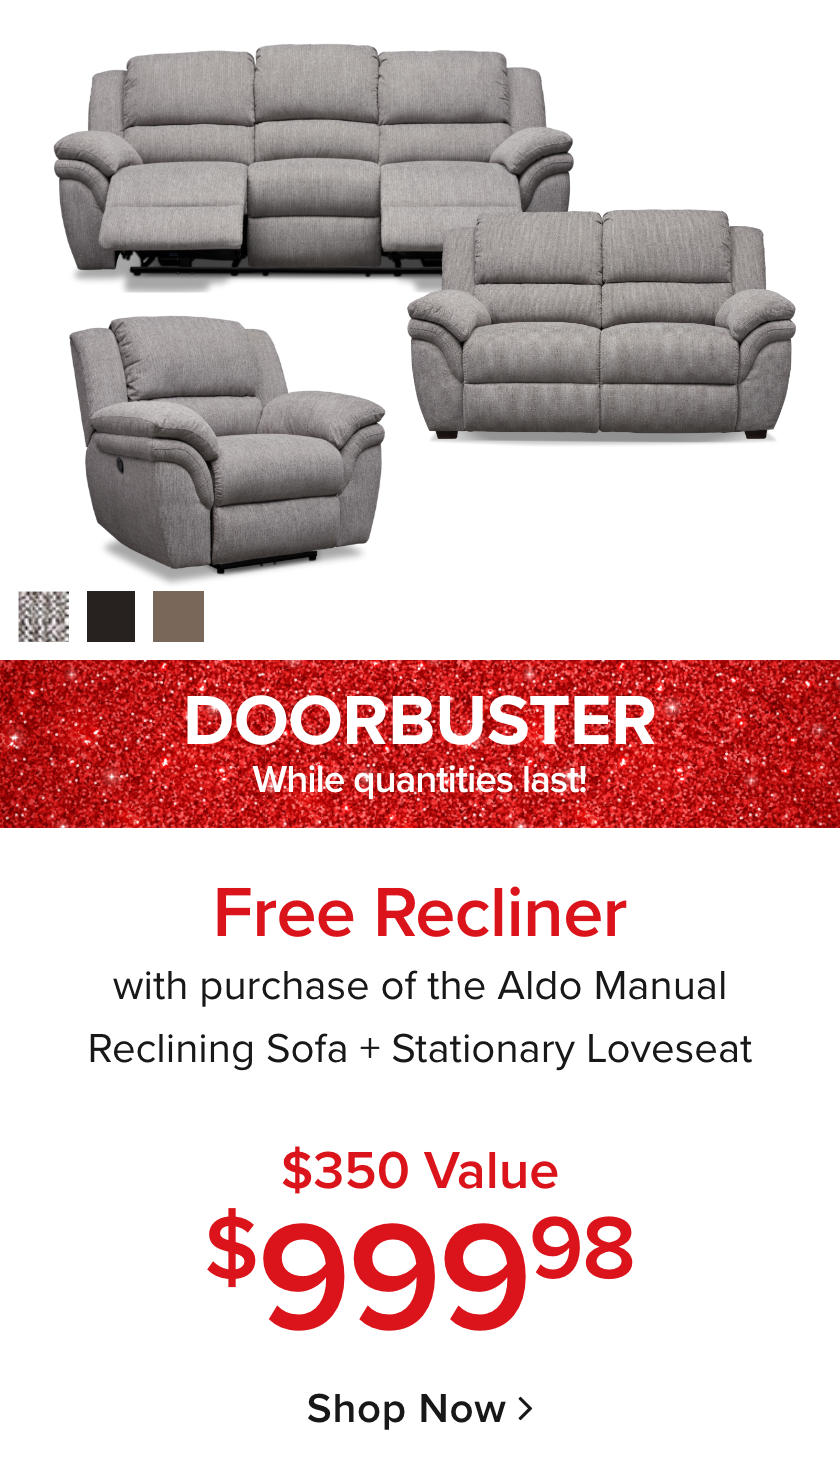 Aldo + FREE Recliner